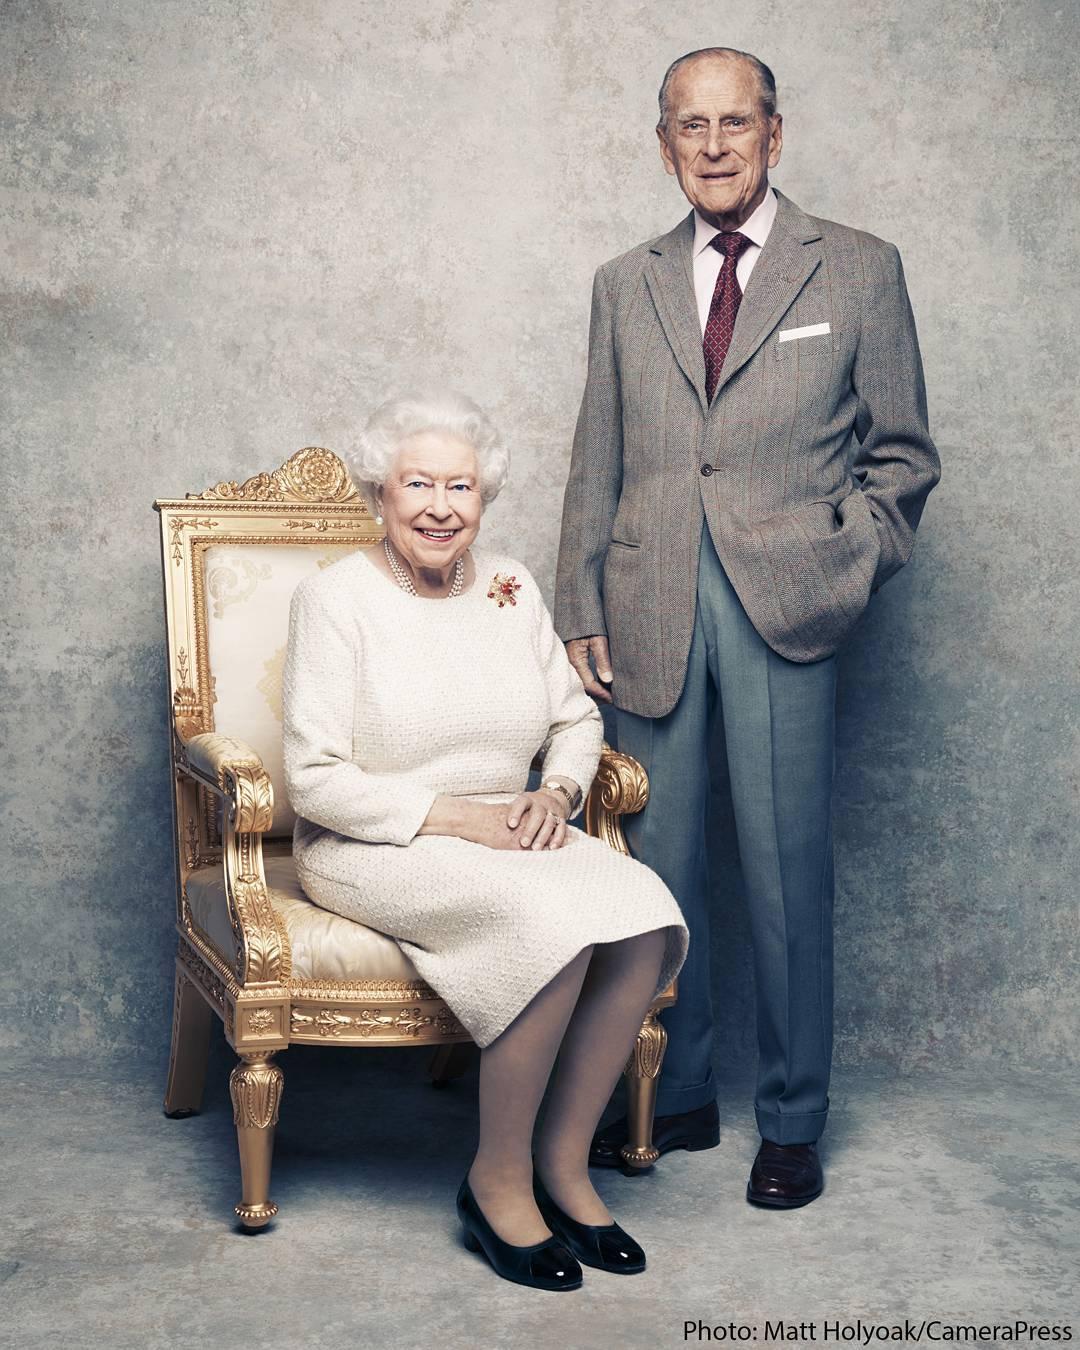 Queen Elizabeth and Prince Philip 70th Anniversary Portrait